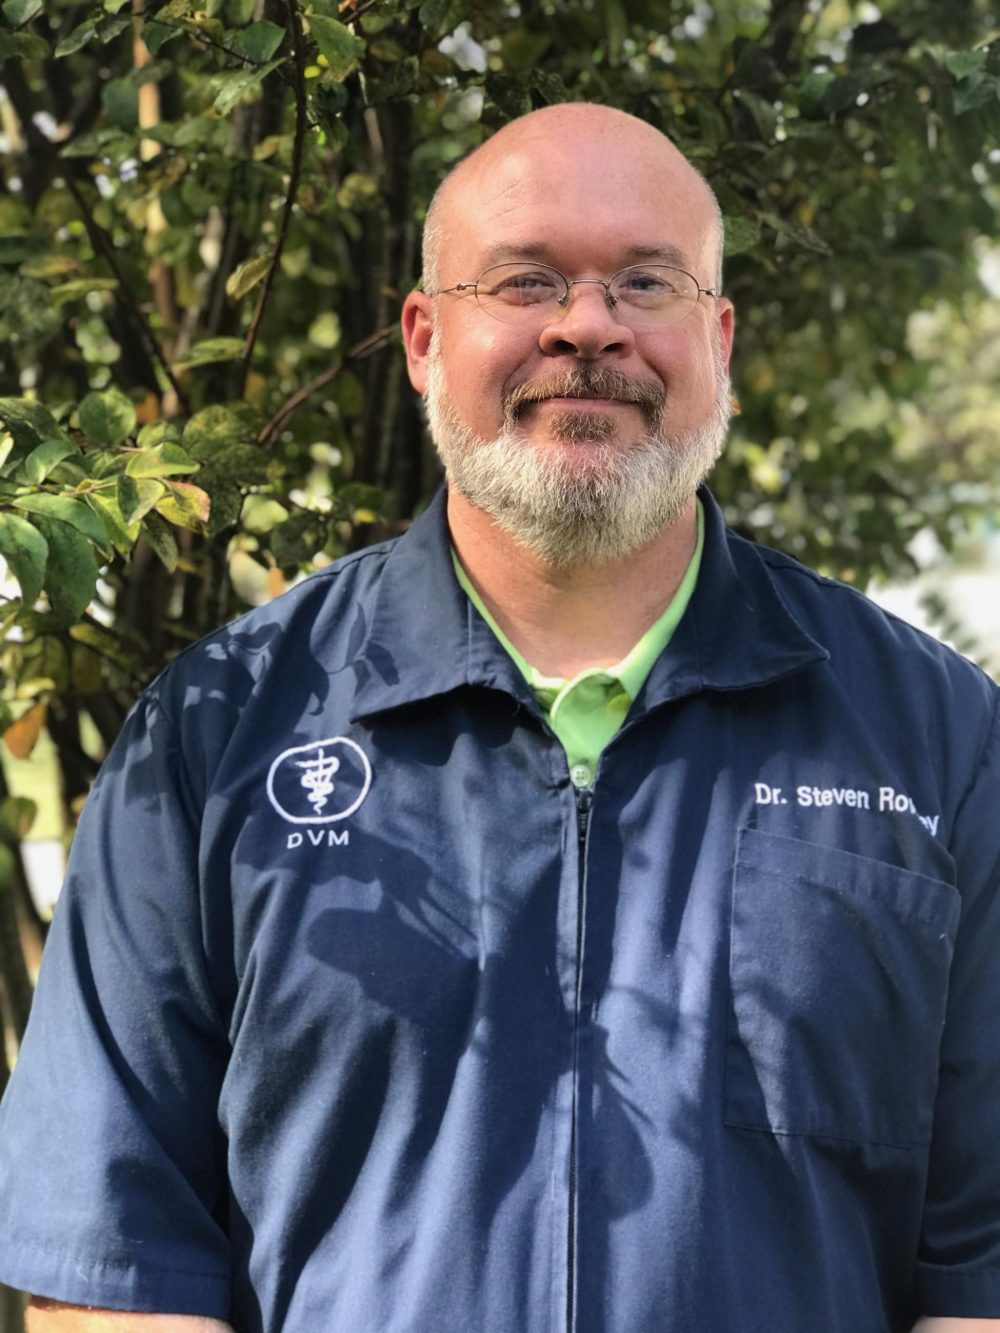 Milton FL Veterinarian - Santa Rosa Veterinary Clinic Dr Rowley